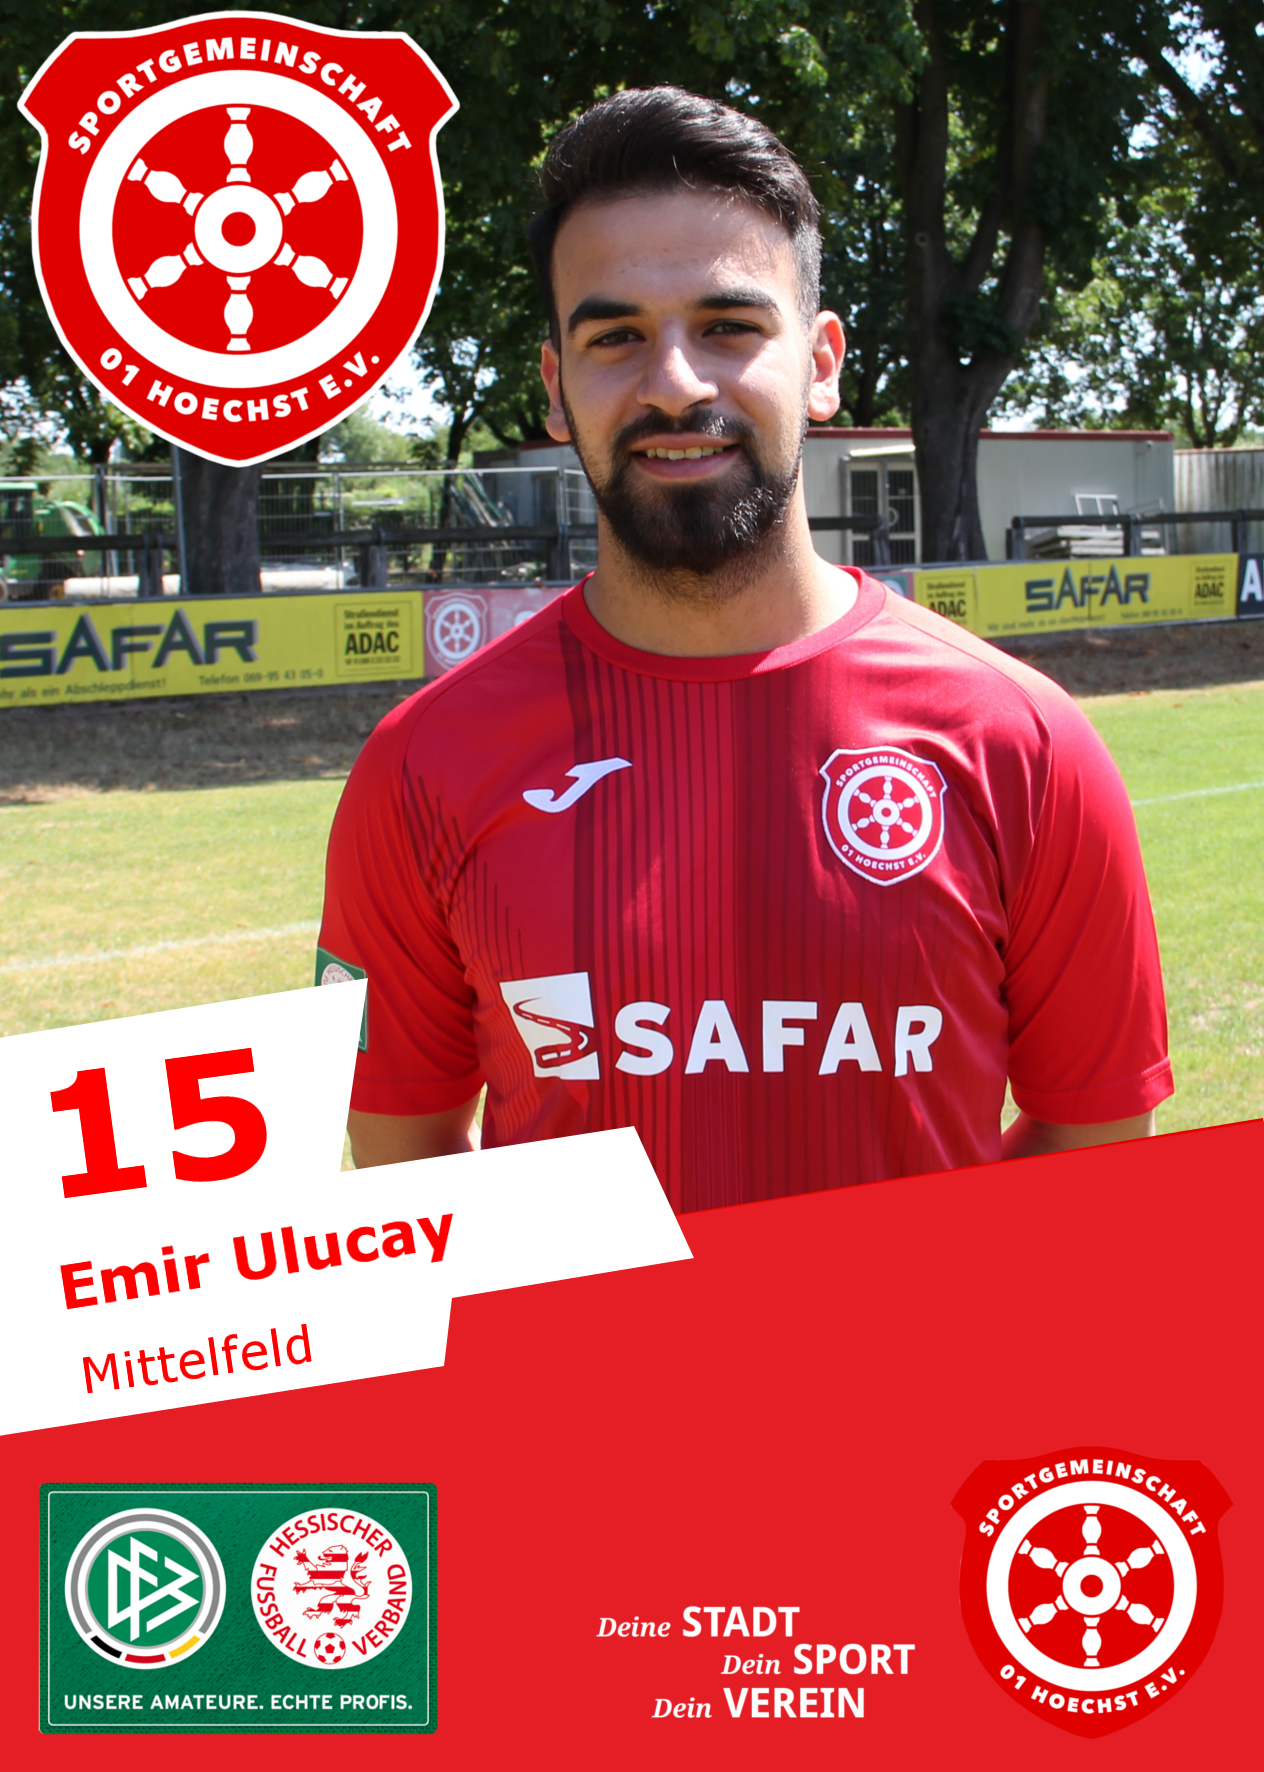 Ulucay